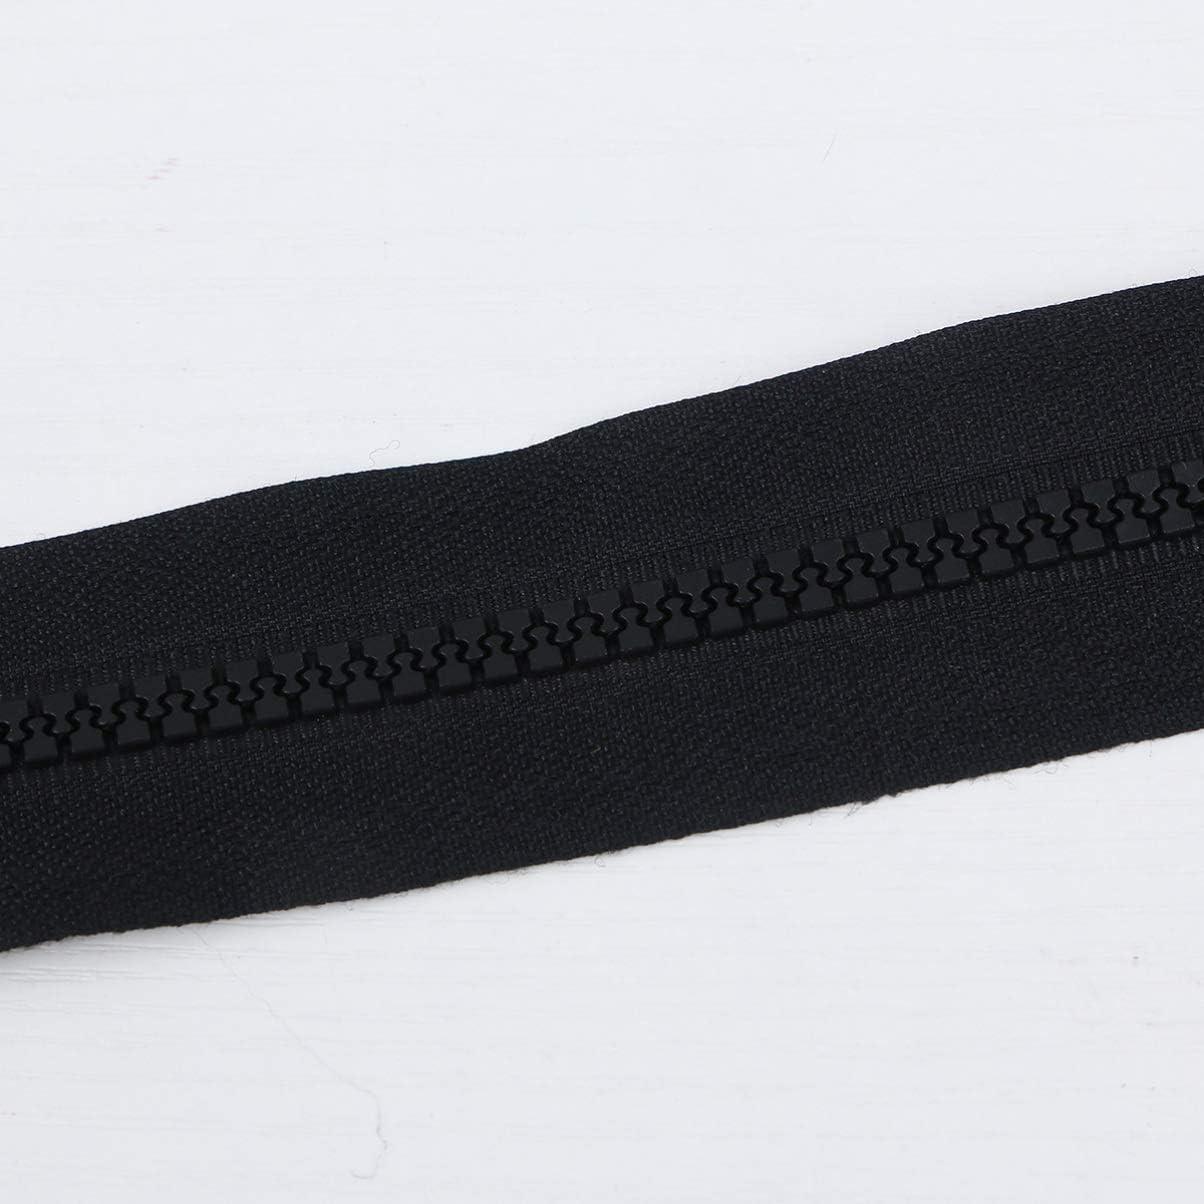 HEALLILY Nylon Zippers Separating Zipper Y-Teeth Metal Zippers for Jackets Coats Crafts 90cm